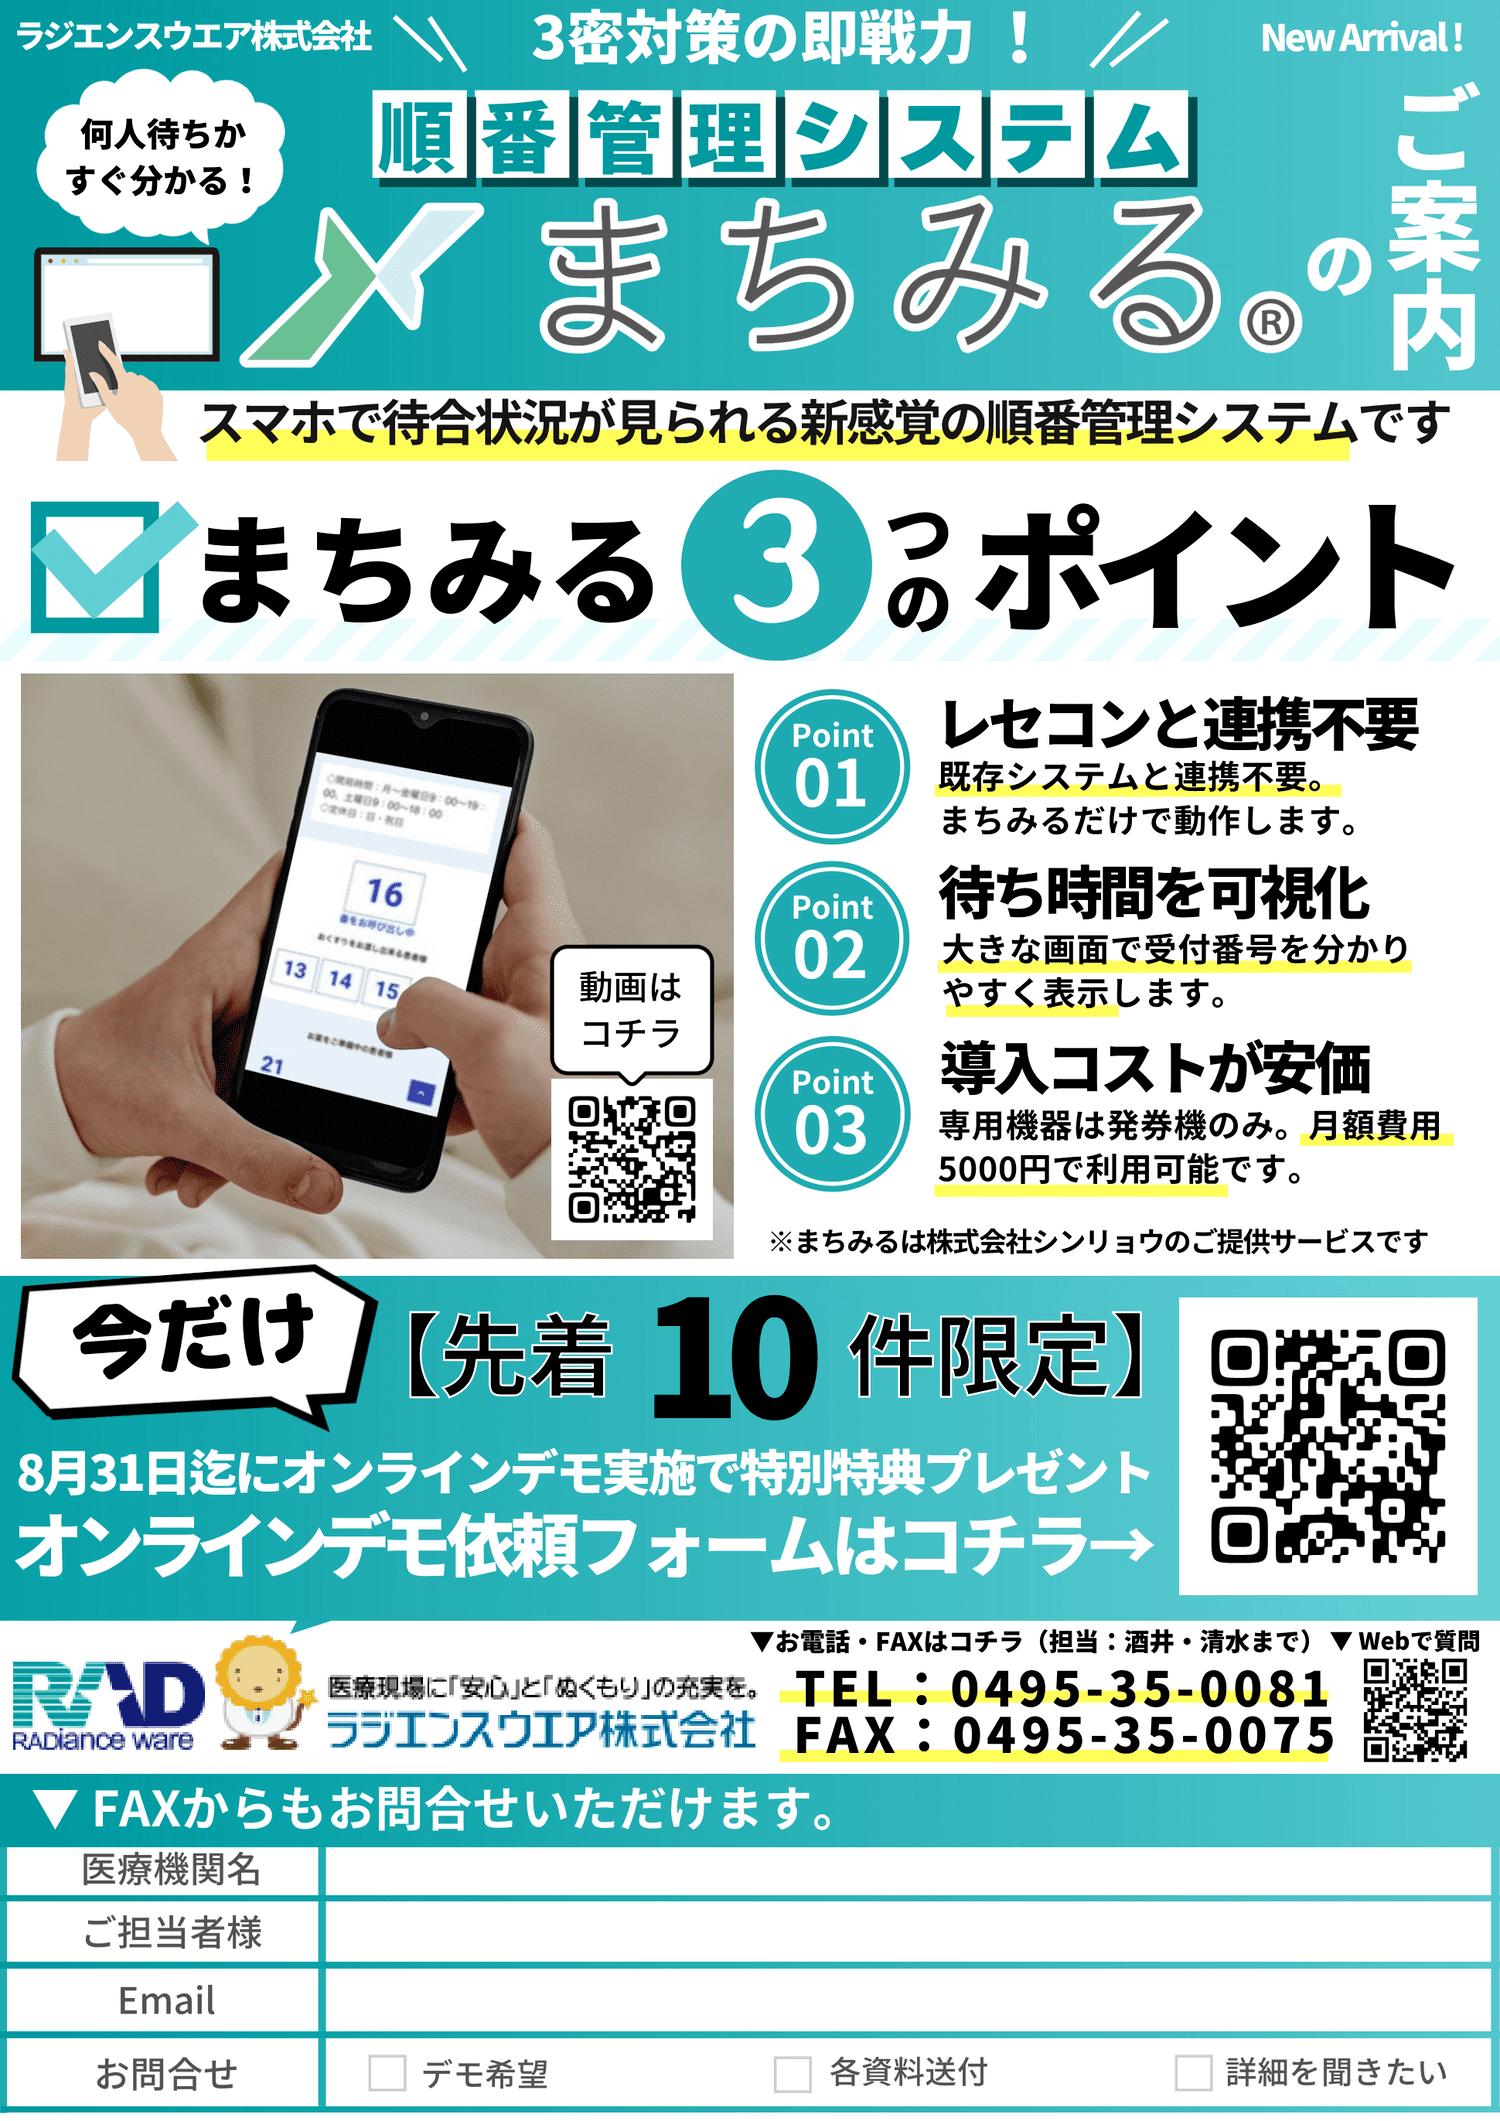 machimiru_dm